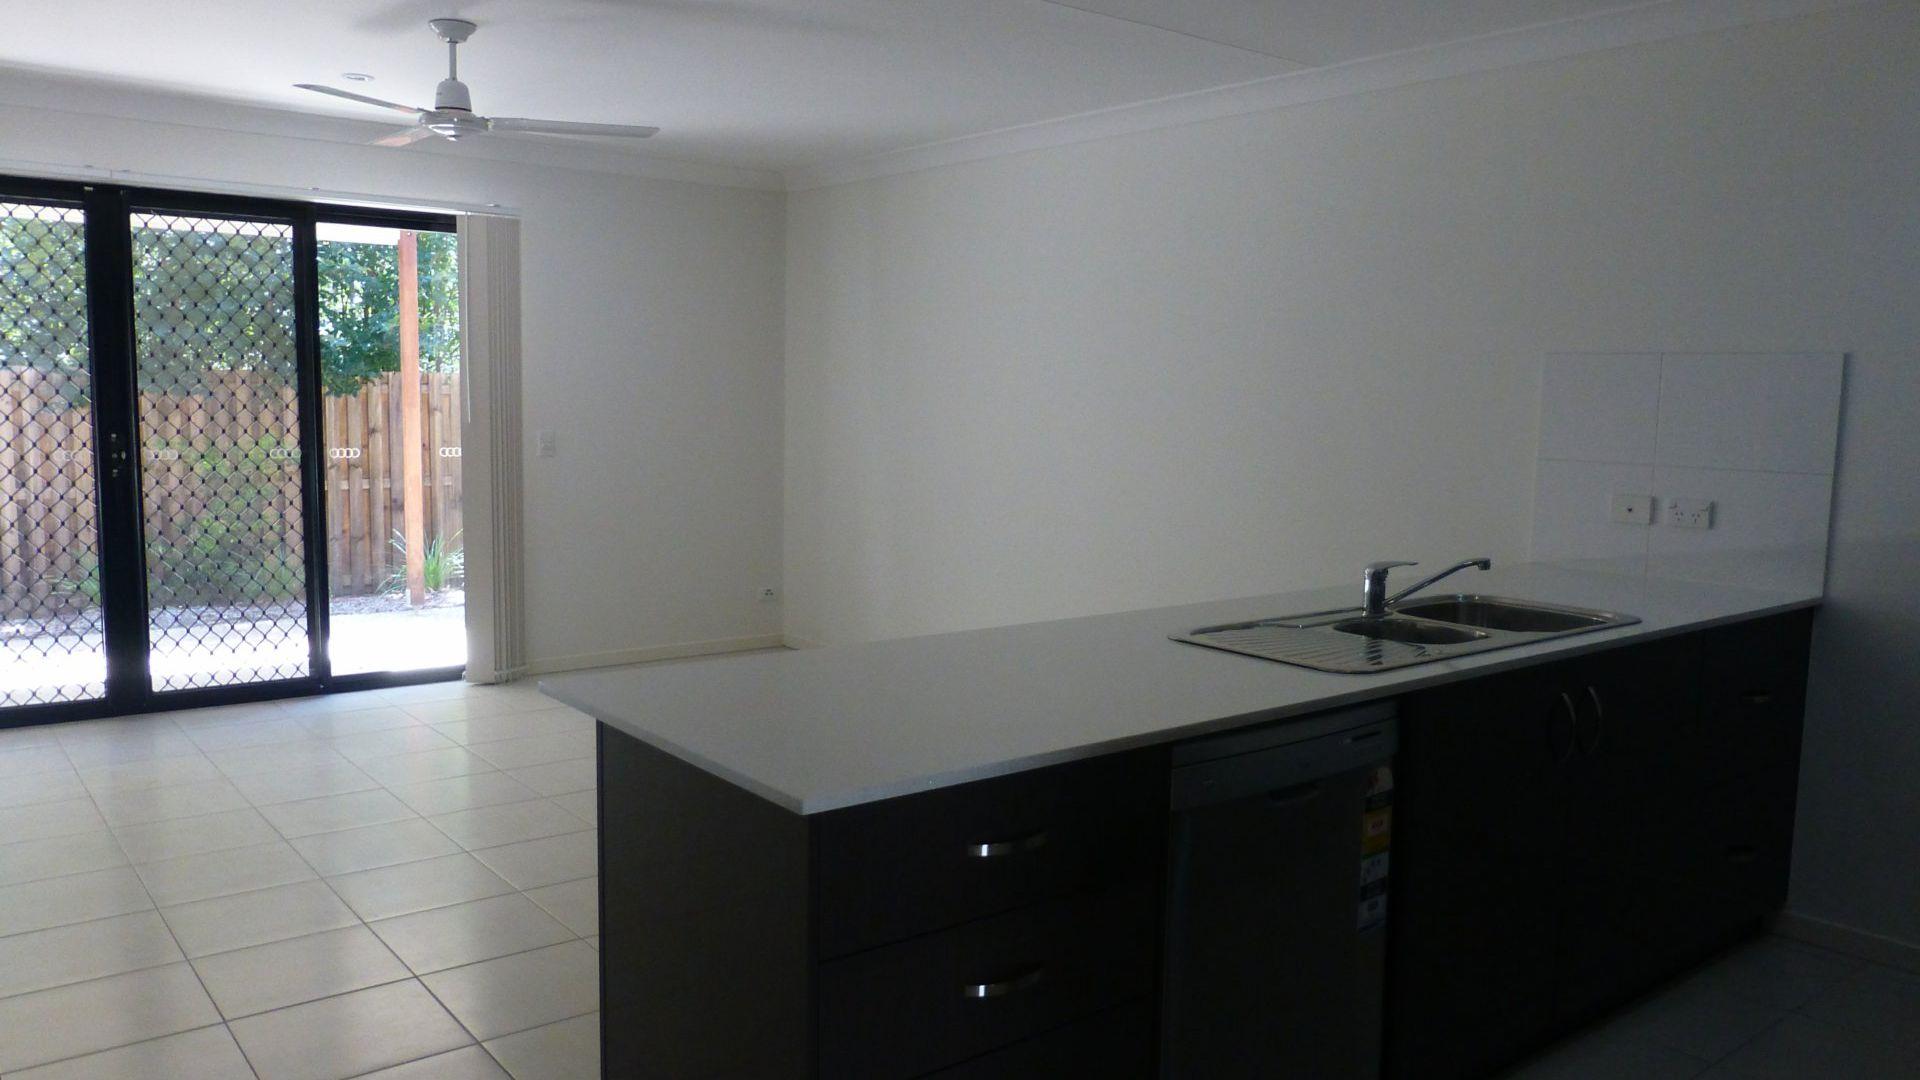 15/77 Menser Street, Calamvale QLD 4116, Image 2